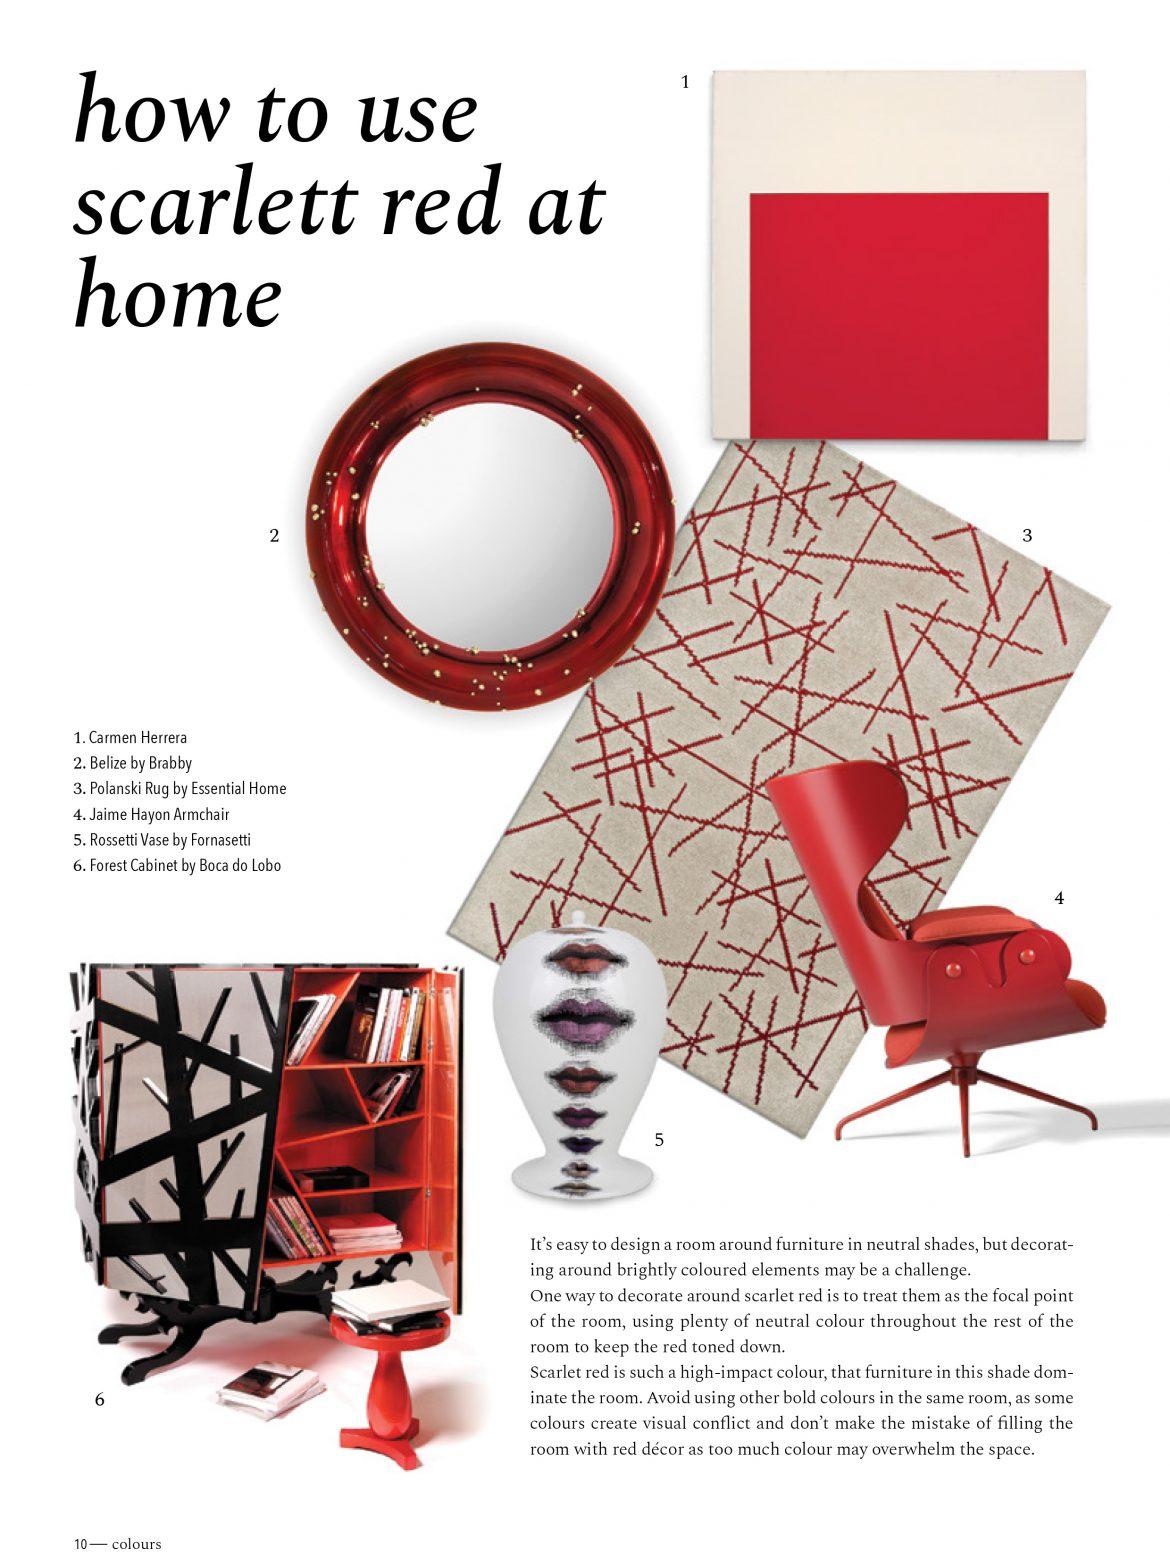 Das Farbe-Trendbuch 2018: Scarlet Rot farbe-trendbuch 2018 Das Farbe-Trendbuch 2018: Scarlet Rot trends forecast fall winter 2018 book 10